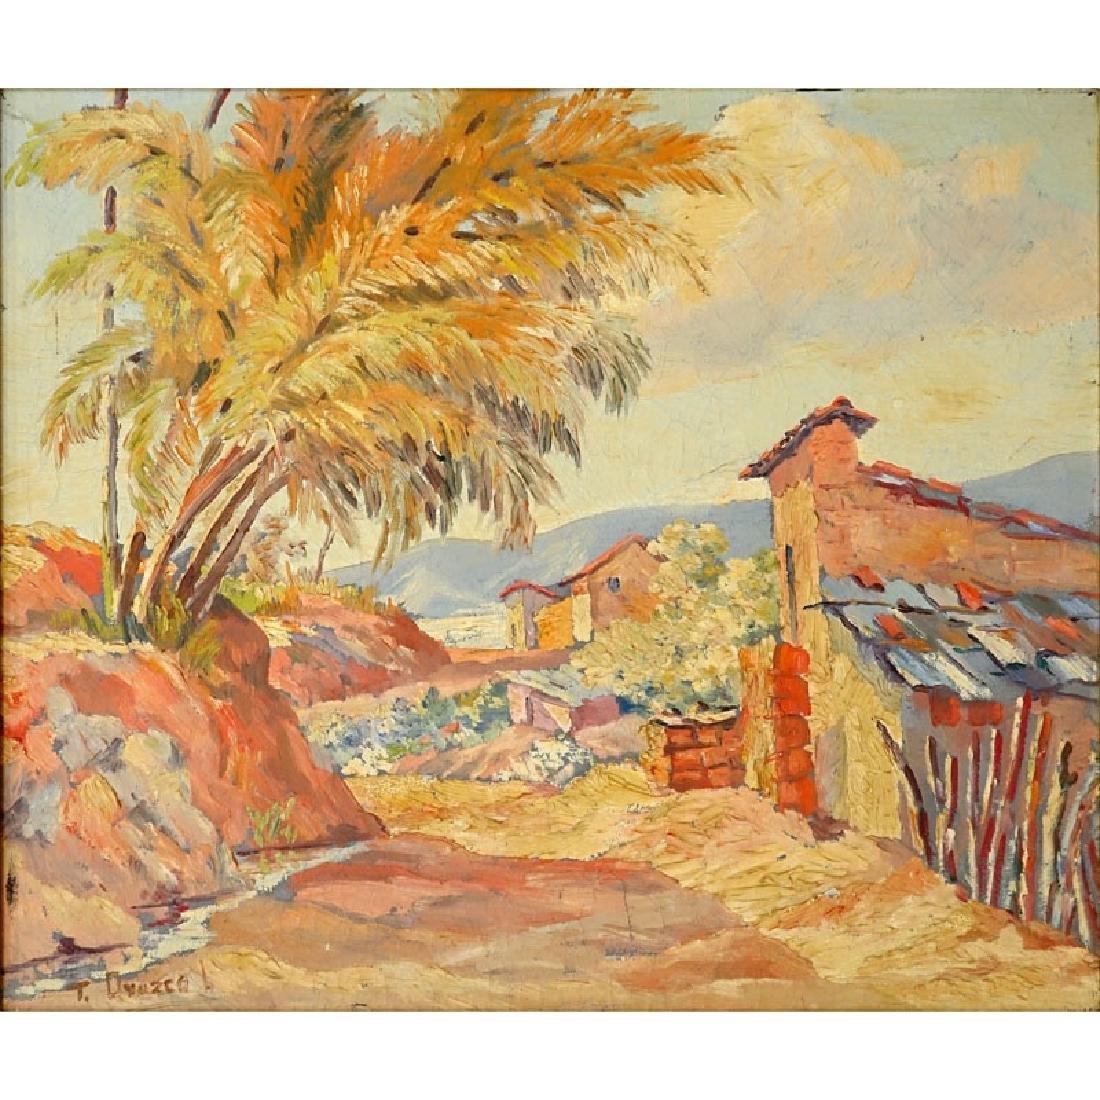 Trino Orozco, Venezuelan (born 1915) Oil on canvas